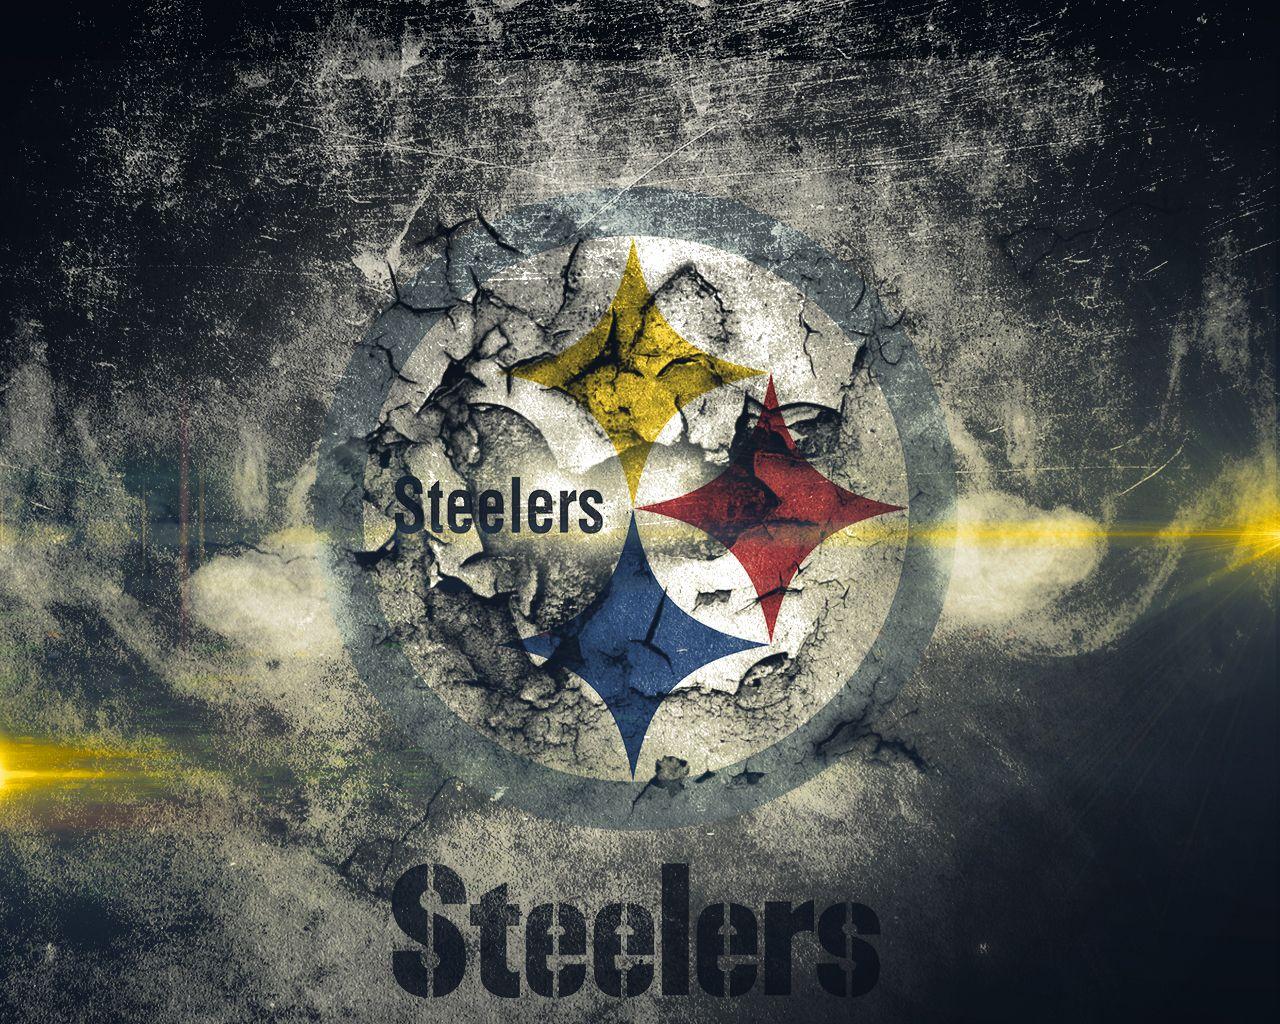 Steelers Wallpaper Wallpaper Zoo Pittsburgh Steelers Wallpaper Steelers Steelers License Plate